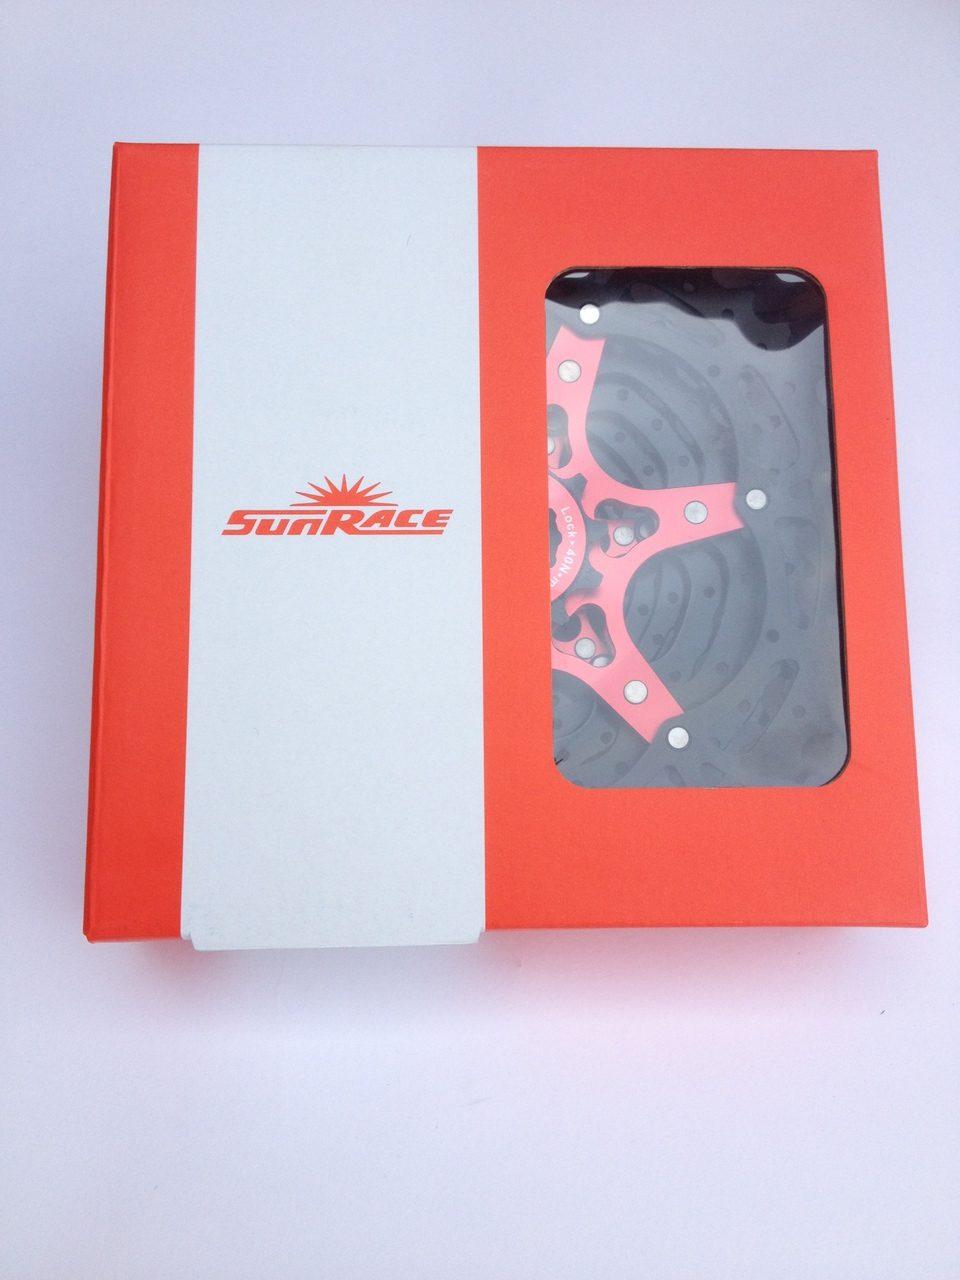 SunRace bicicleta cassette EAZ CSMS8 11 velocidades impulsión flúida más 11-46 metálicos